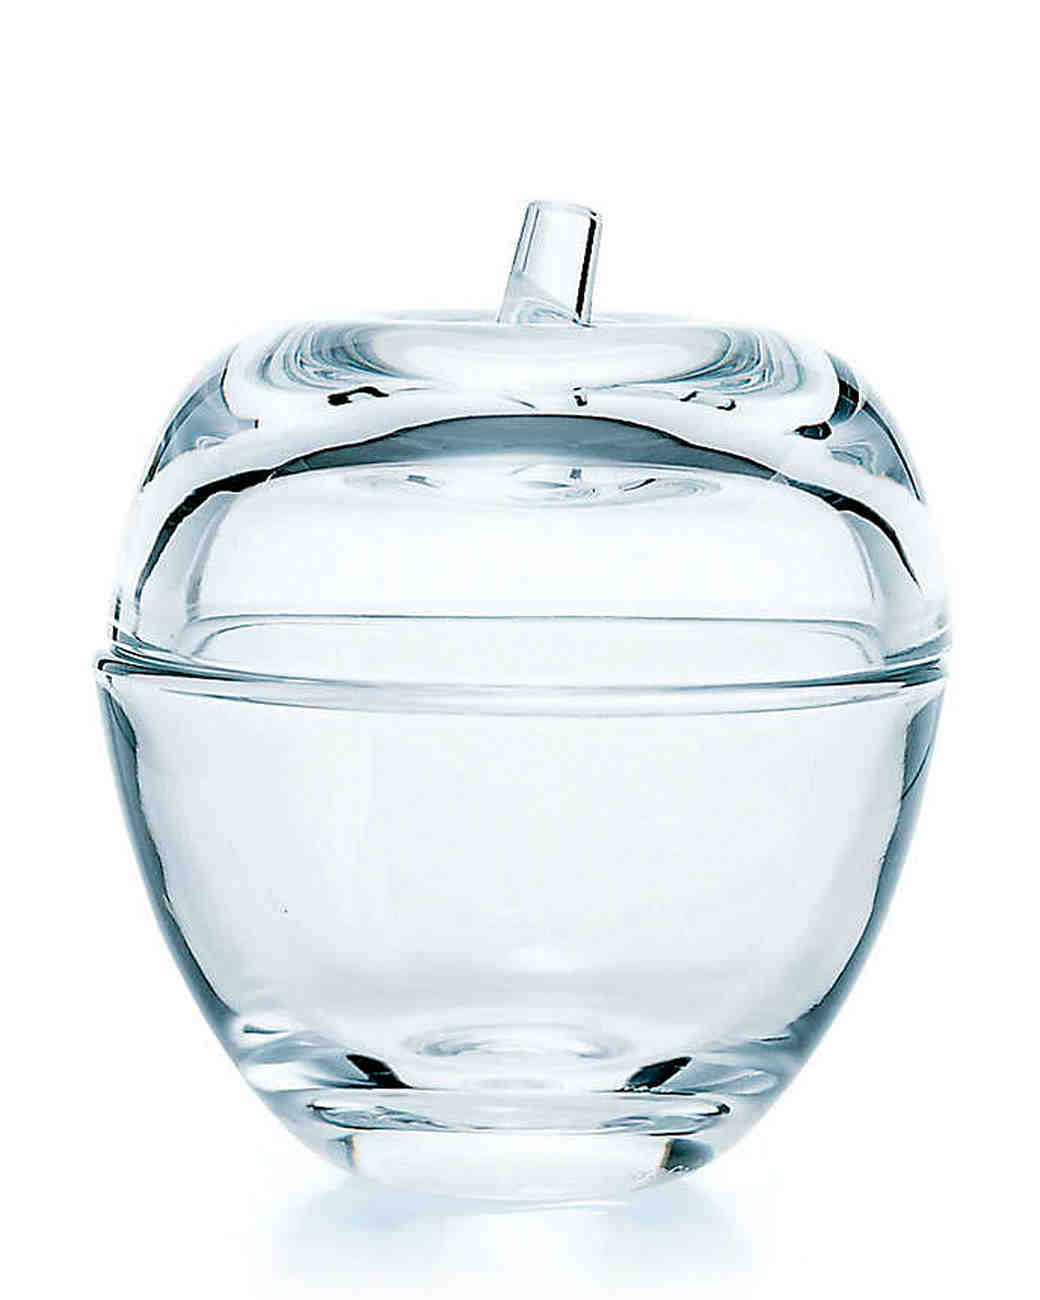 ring-boxes-tiffany-glass-apple-box-0115.jpg